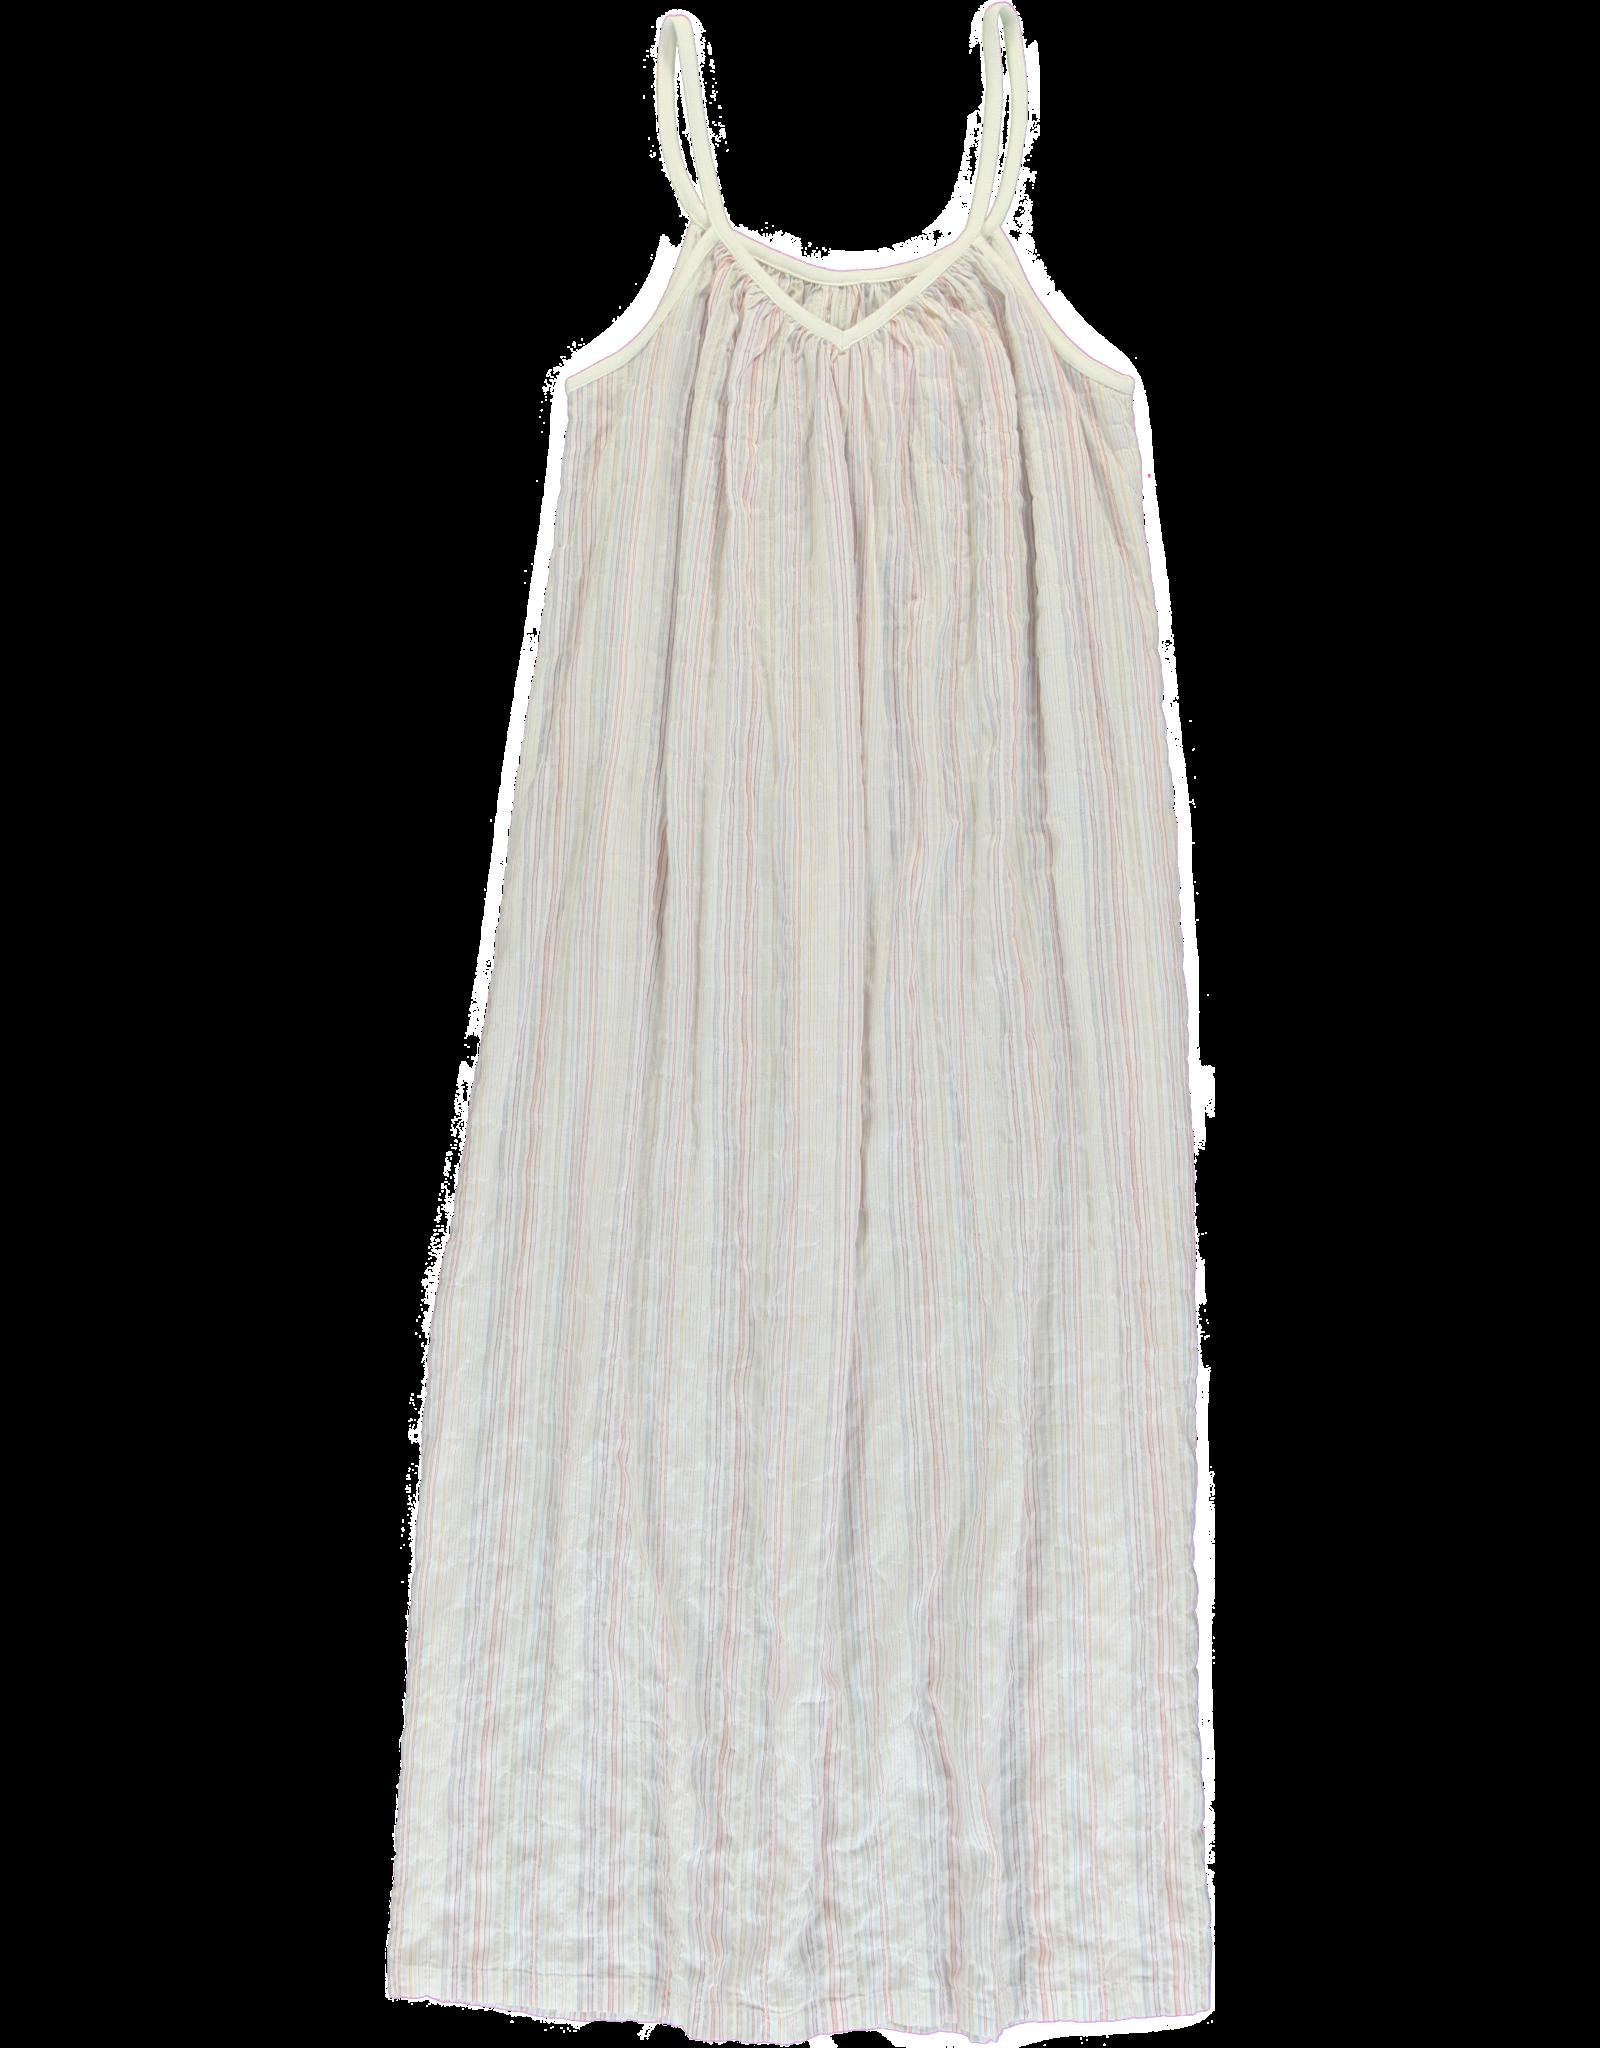 Dorélit Elektra | Nightdress | Stripe Multi